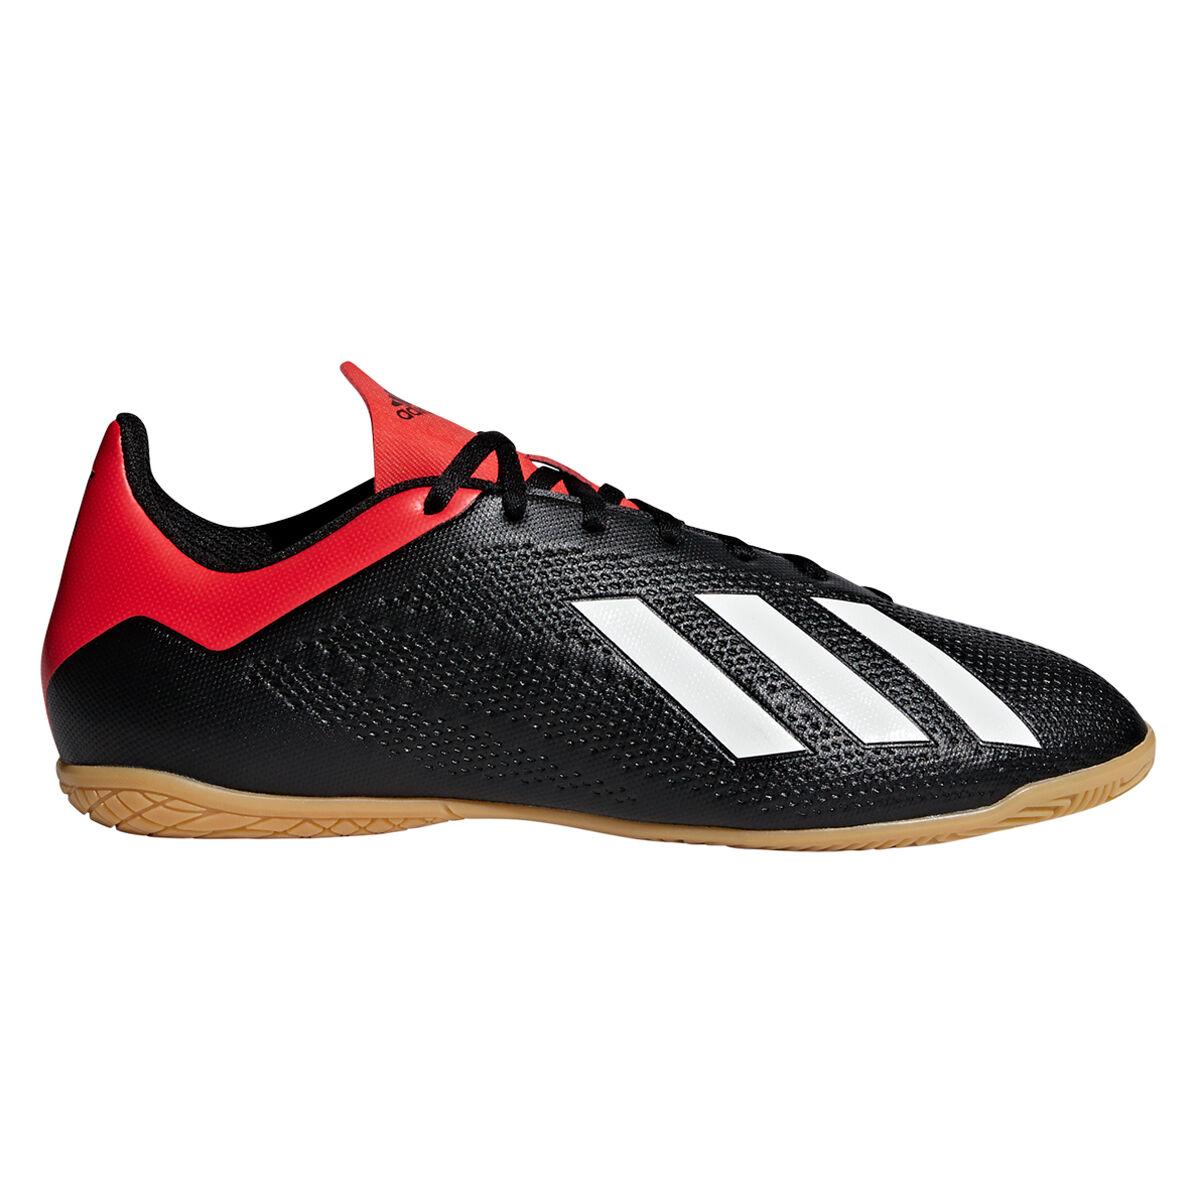 adidas X Tango 18.4 Mens Indoor Soccer Shoes